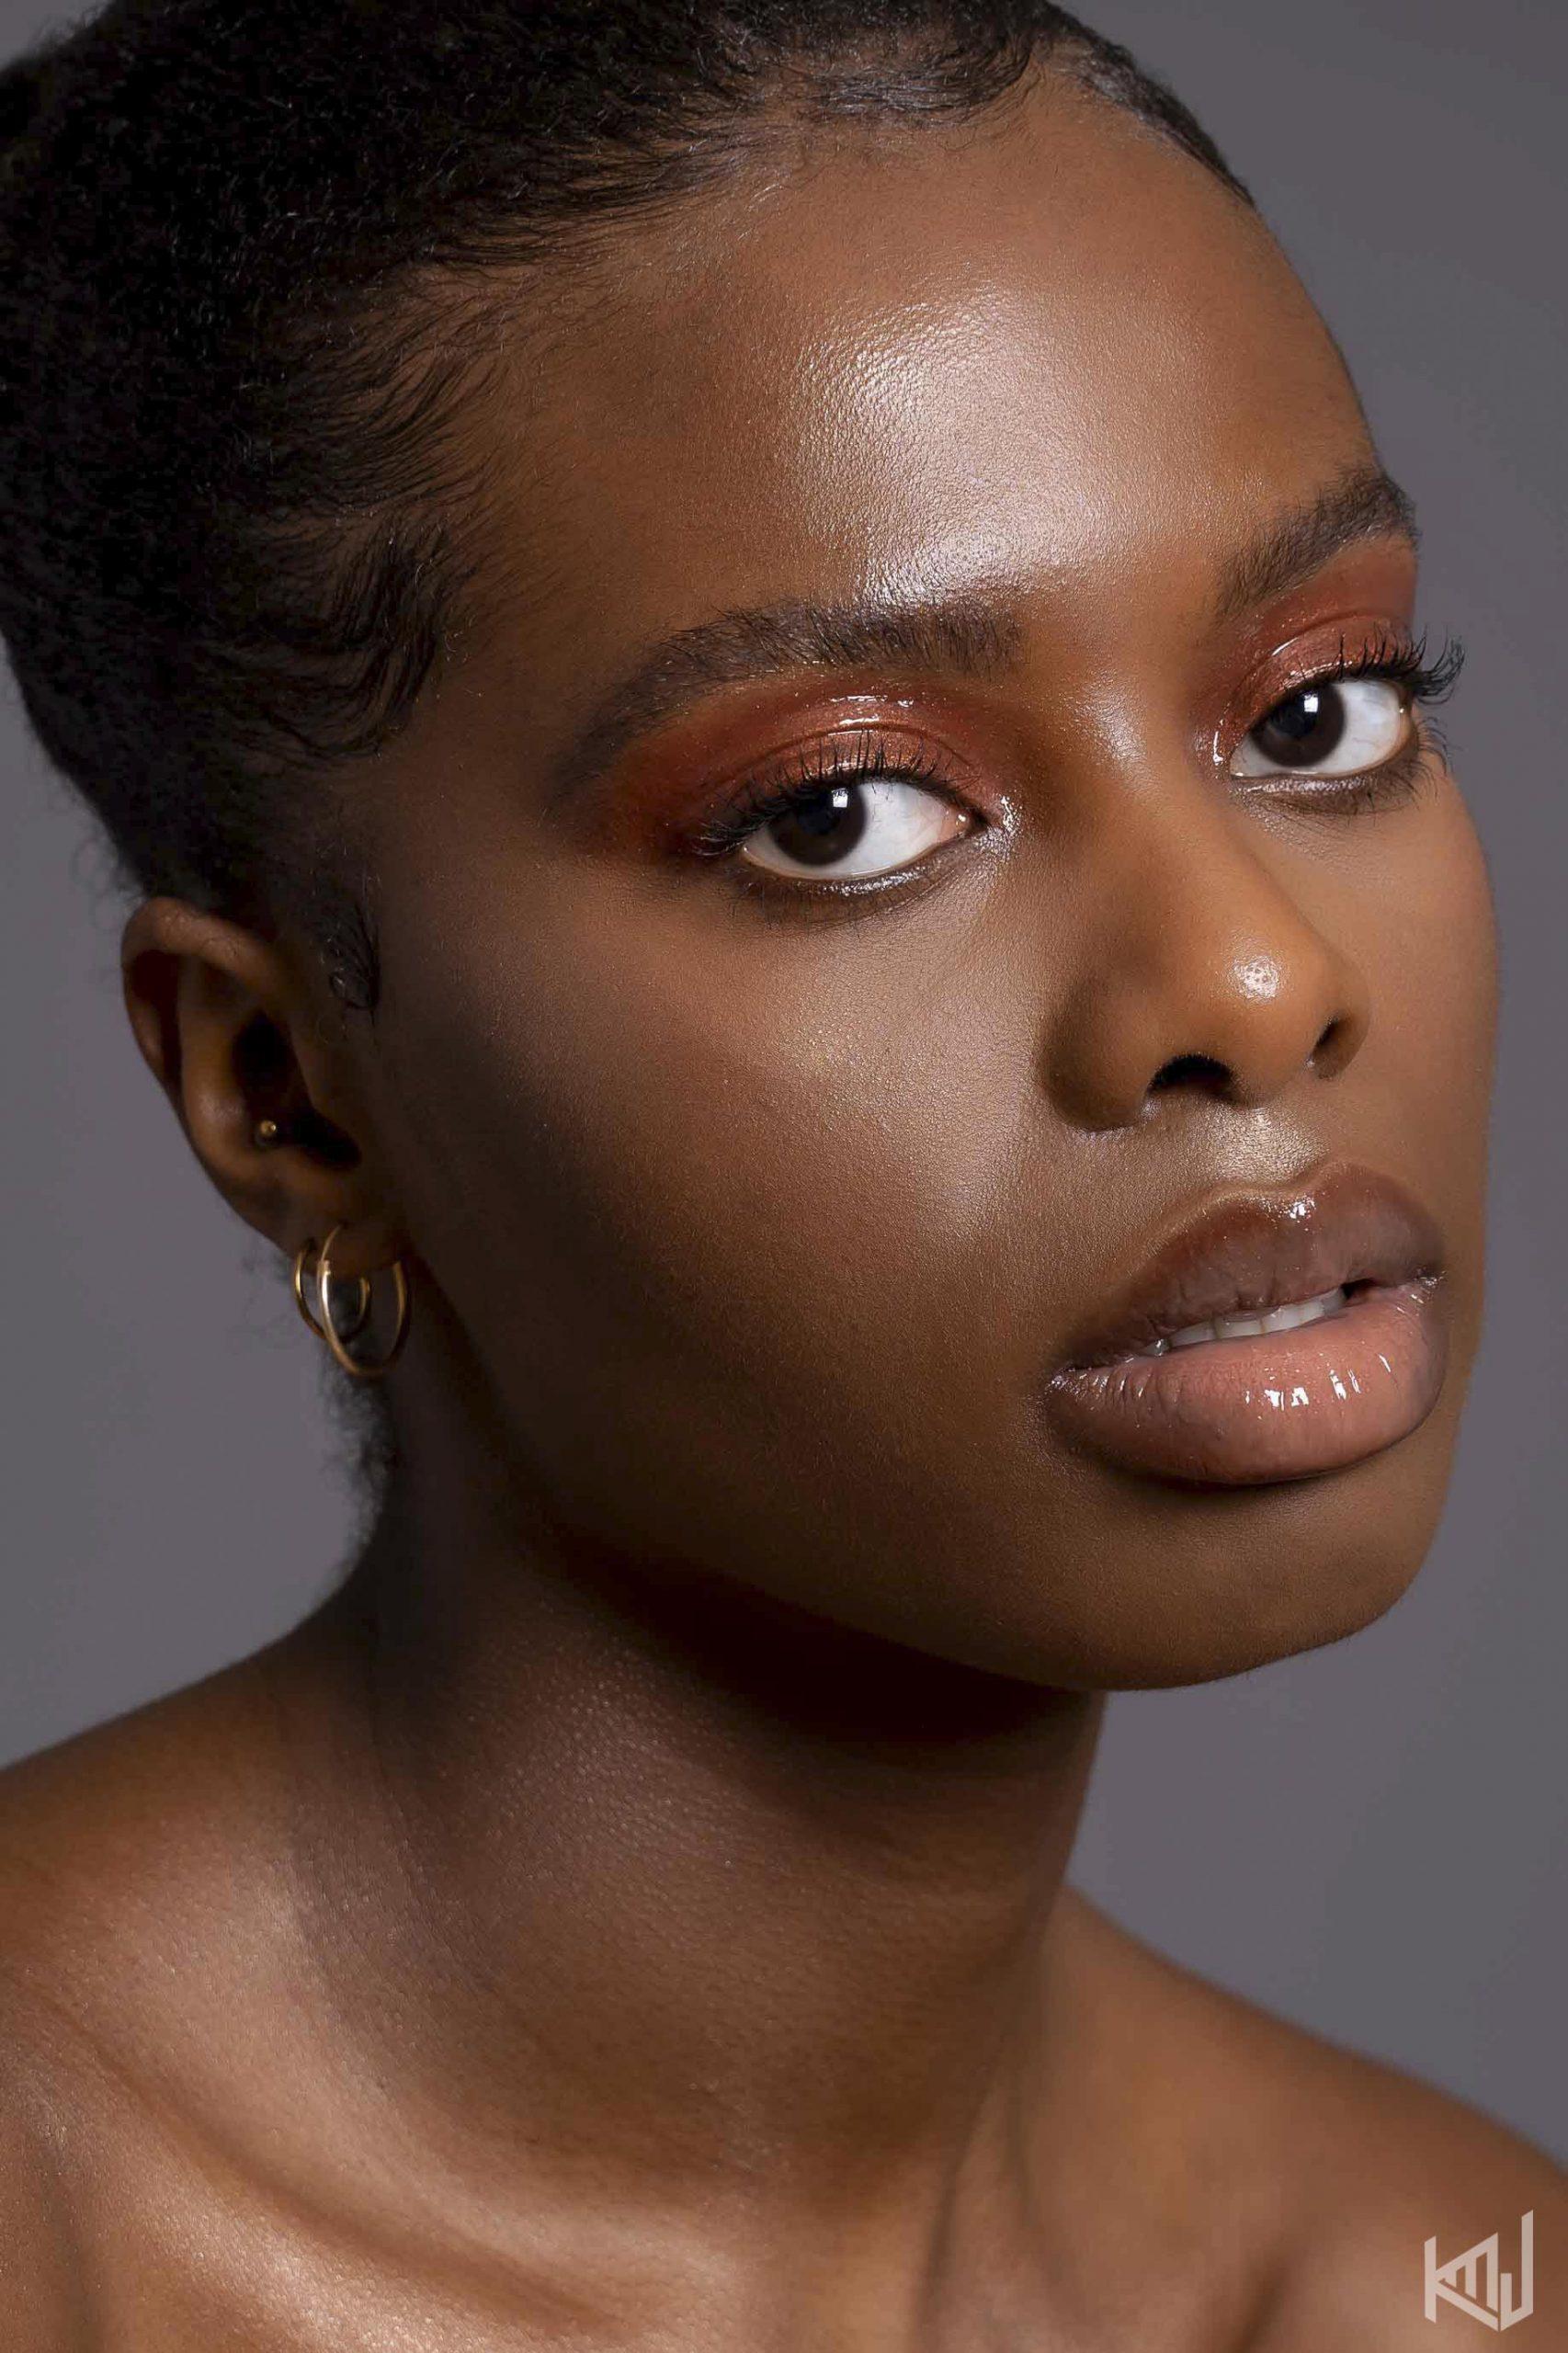 Fotoshooting Models | Modeshooting in Köln | Fotostudio | Fotograf im Studio